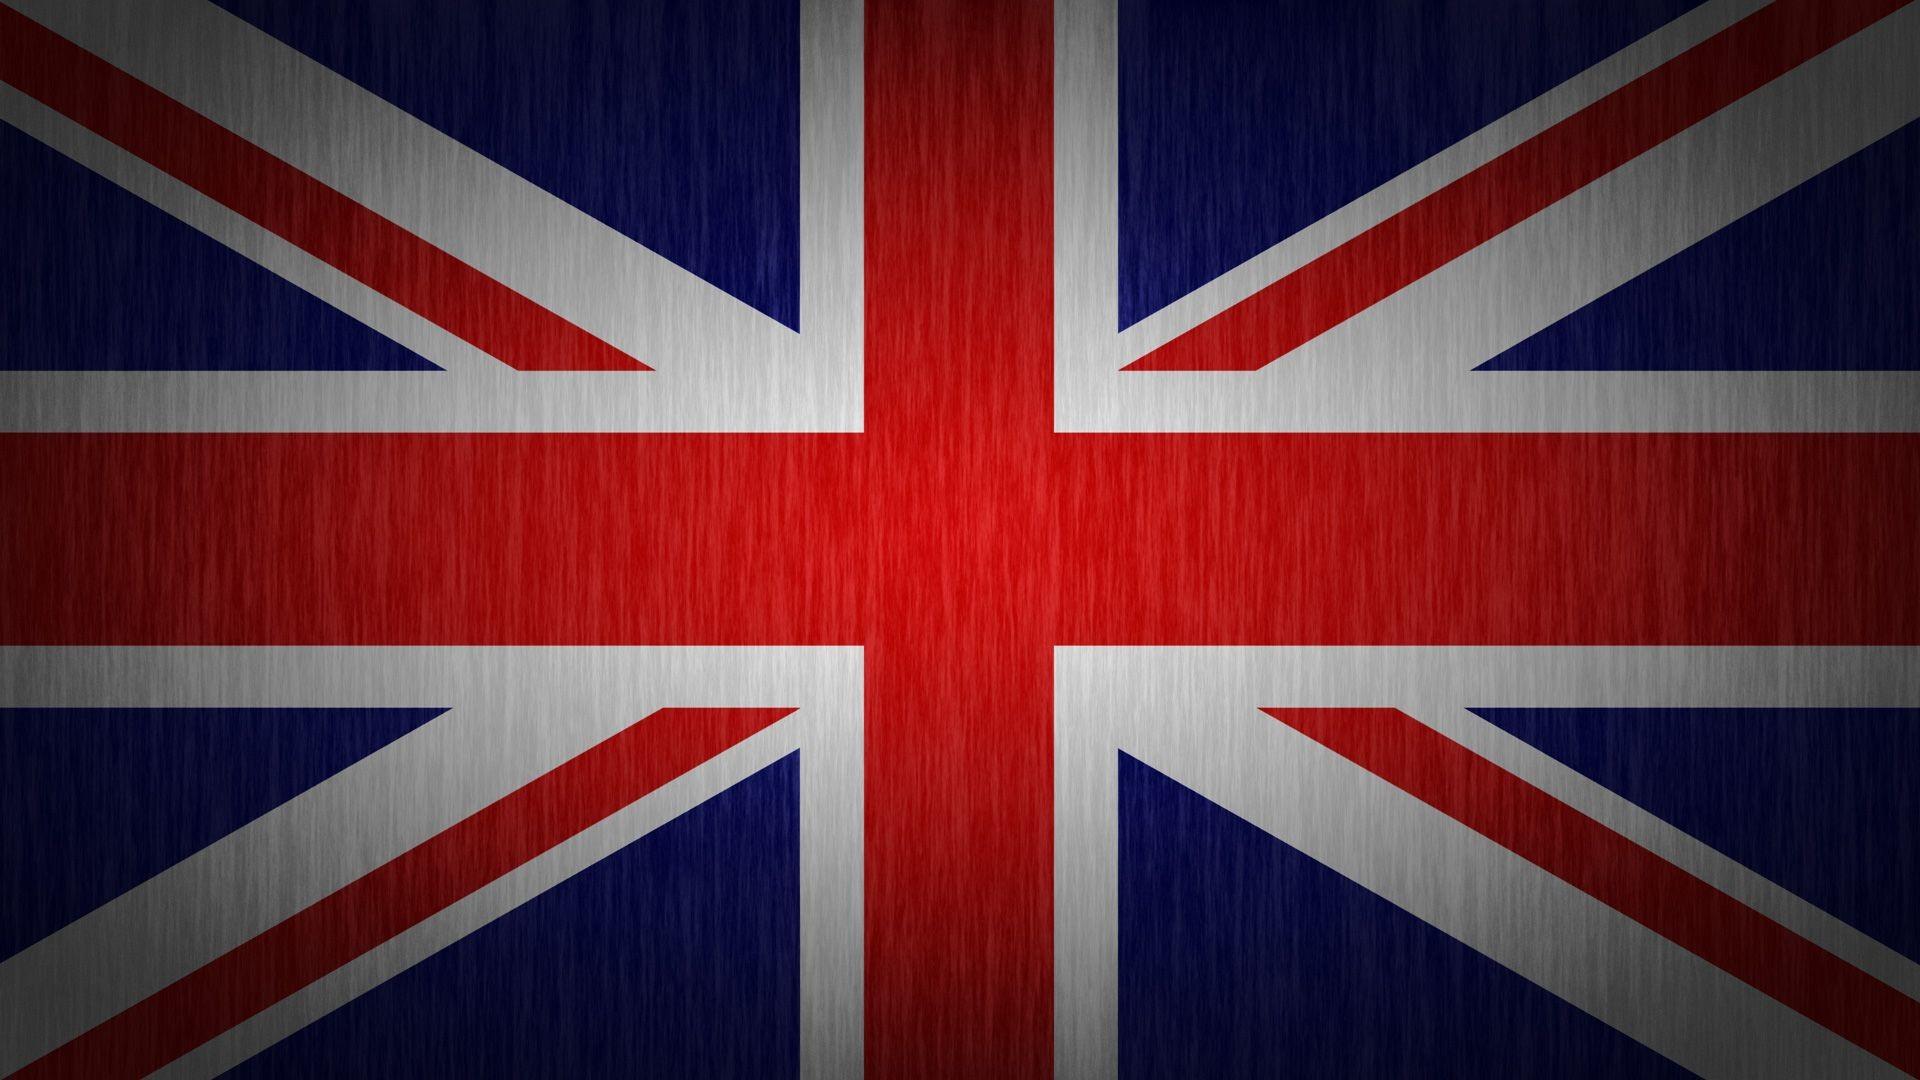 … UK-United-KIngdom-Flag-HD-Wallpapers-images-pics